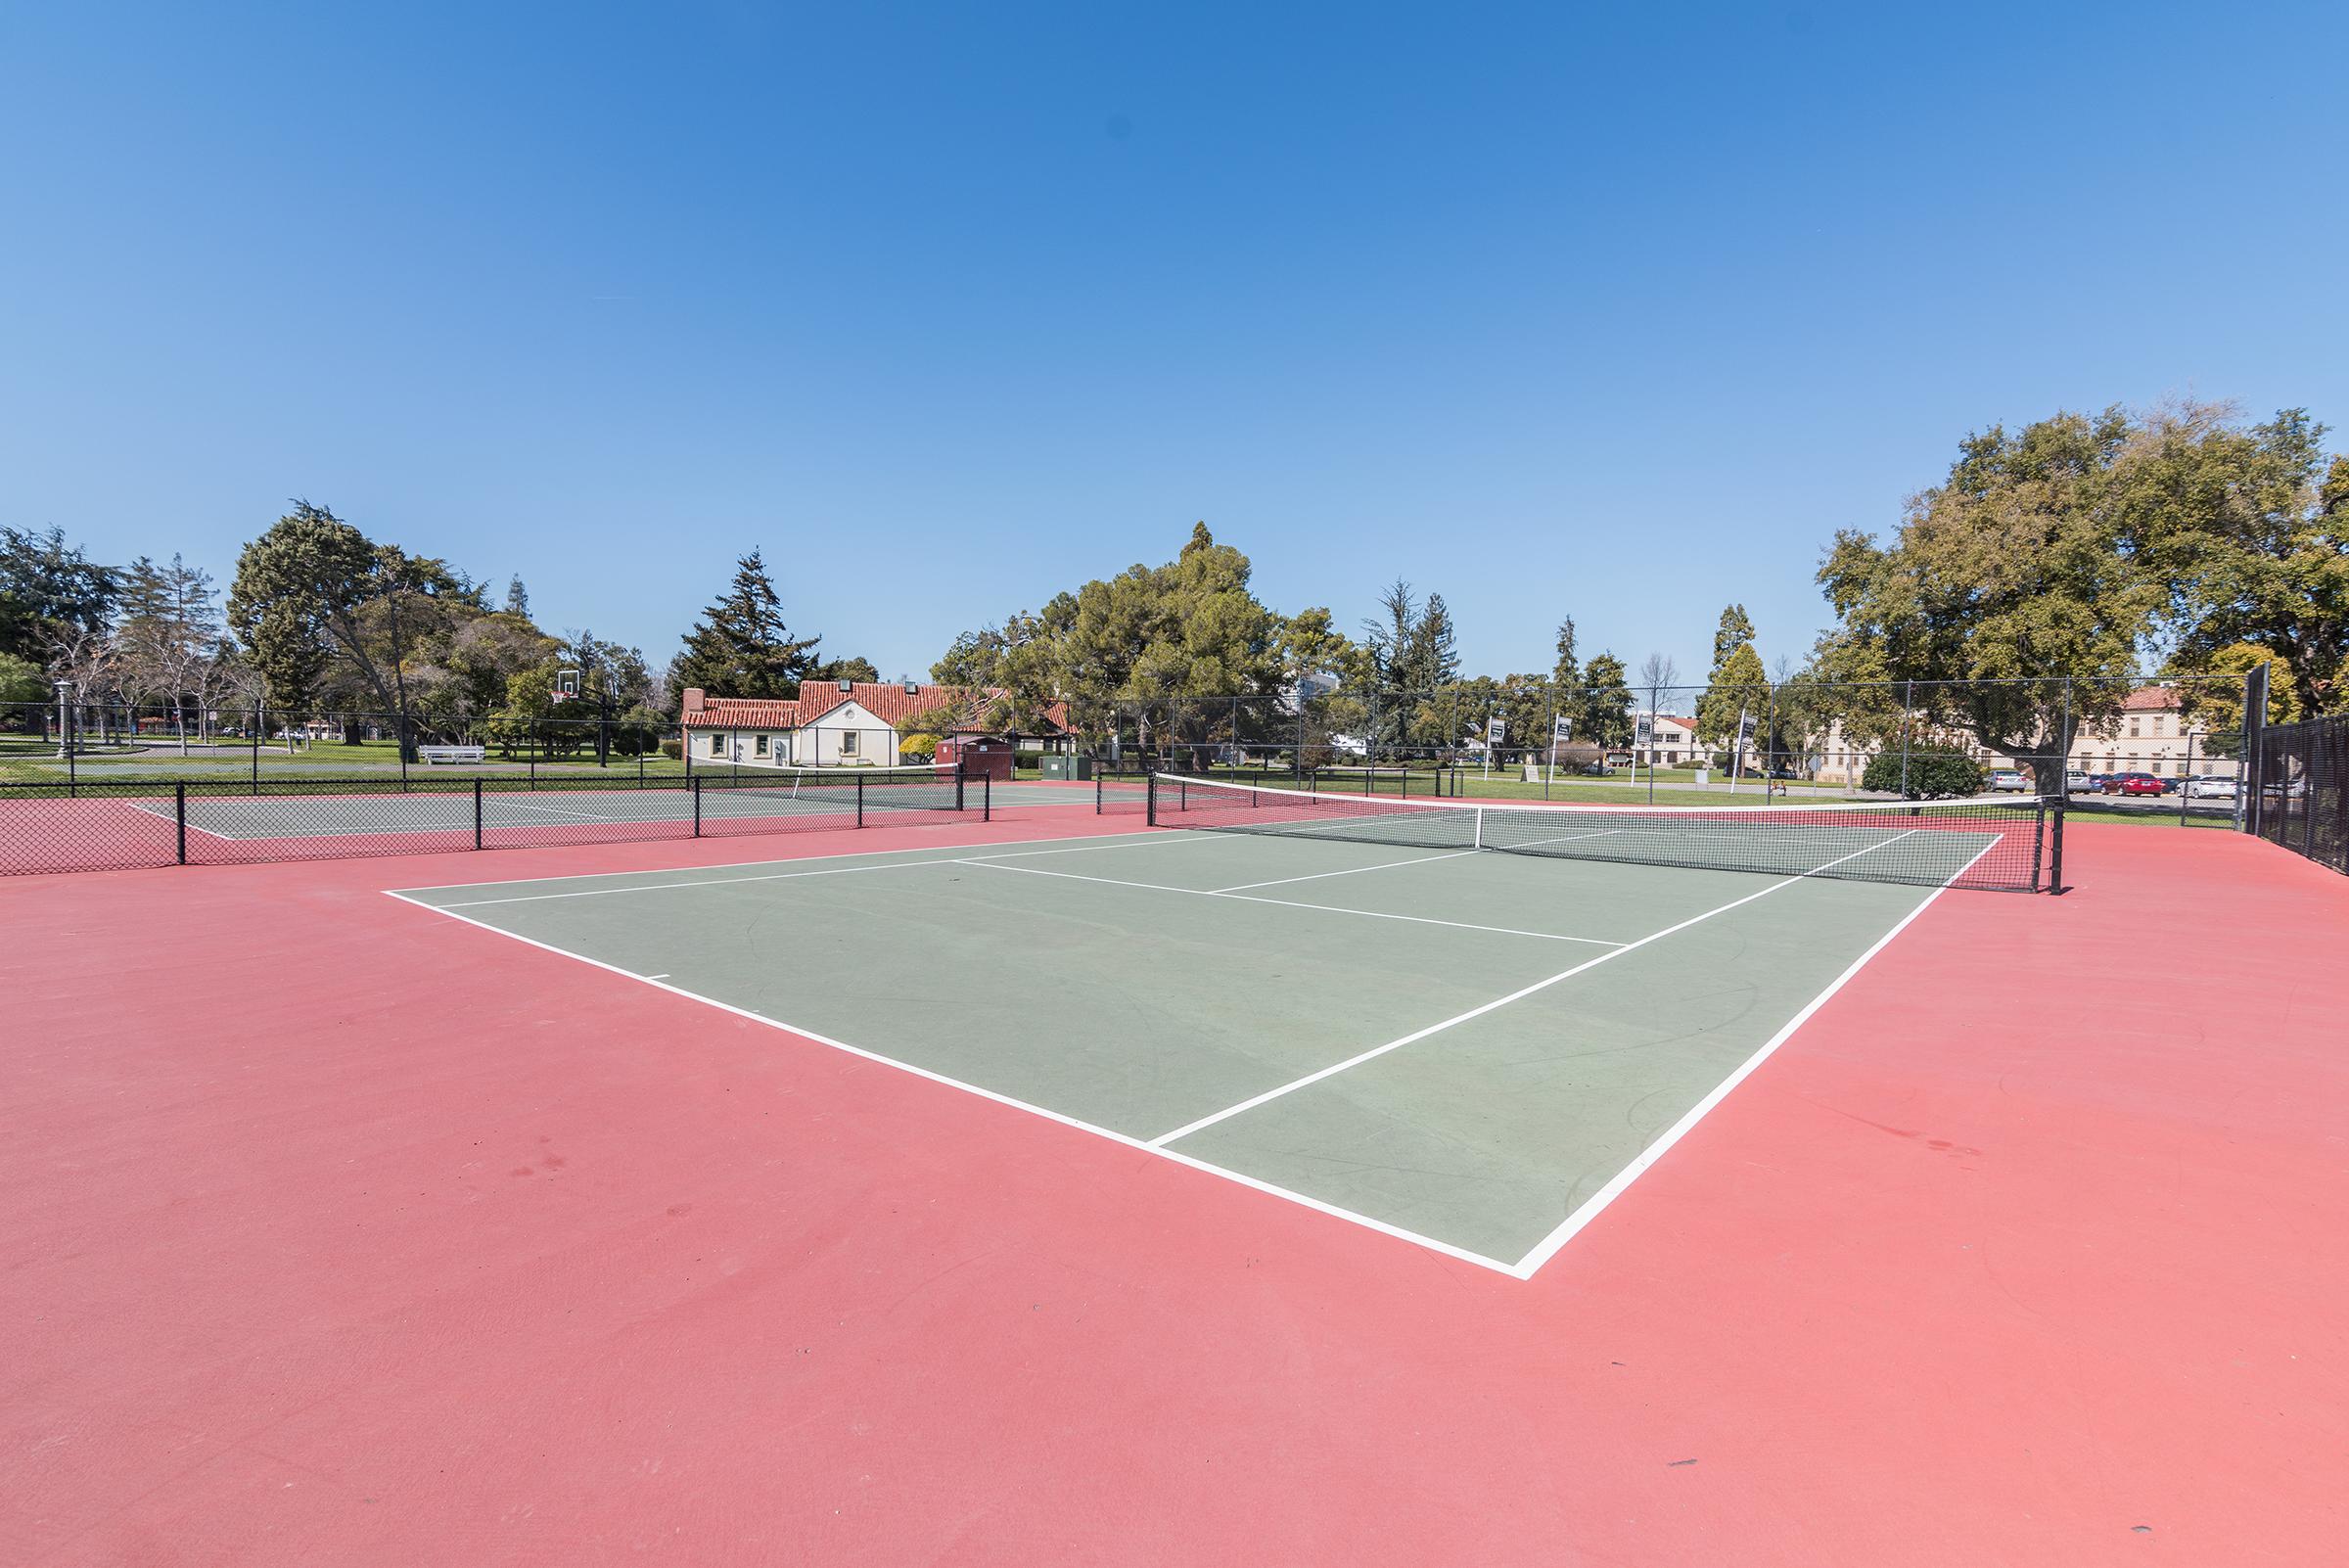 Apartment Community Tennis Courts